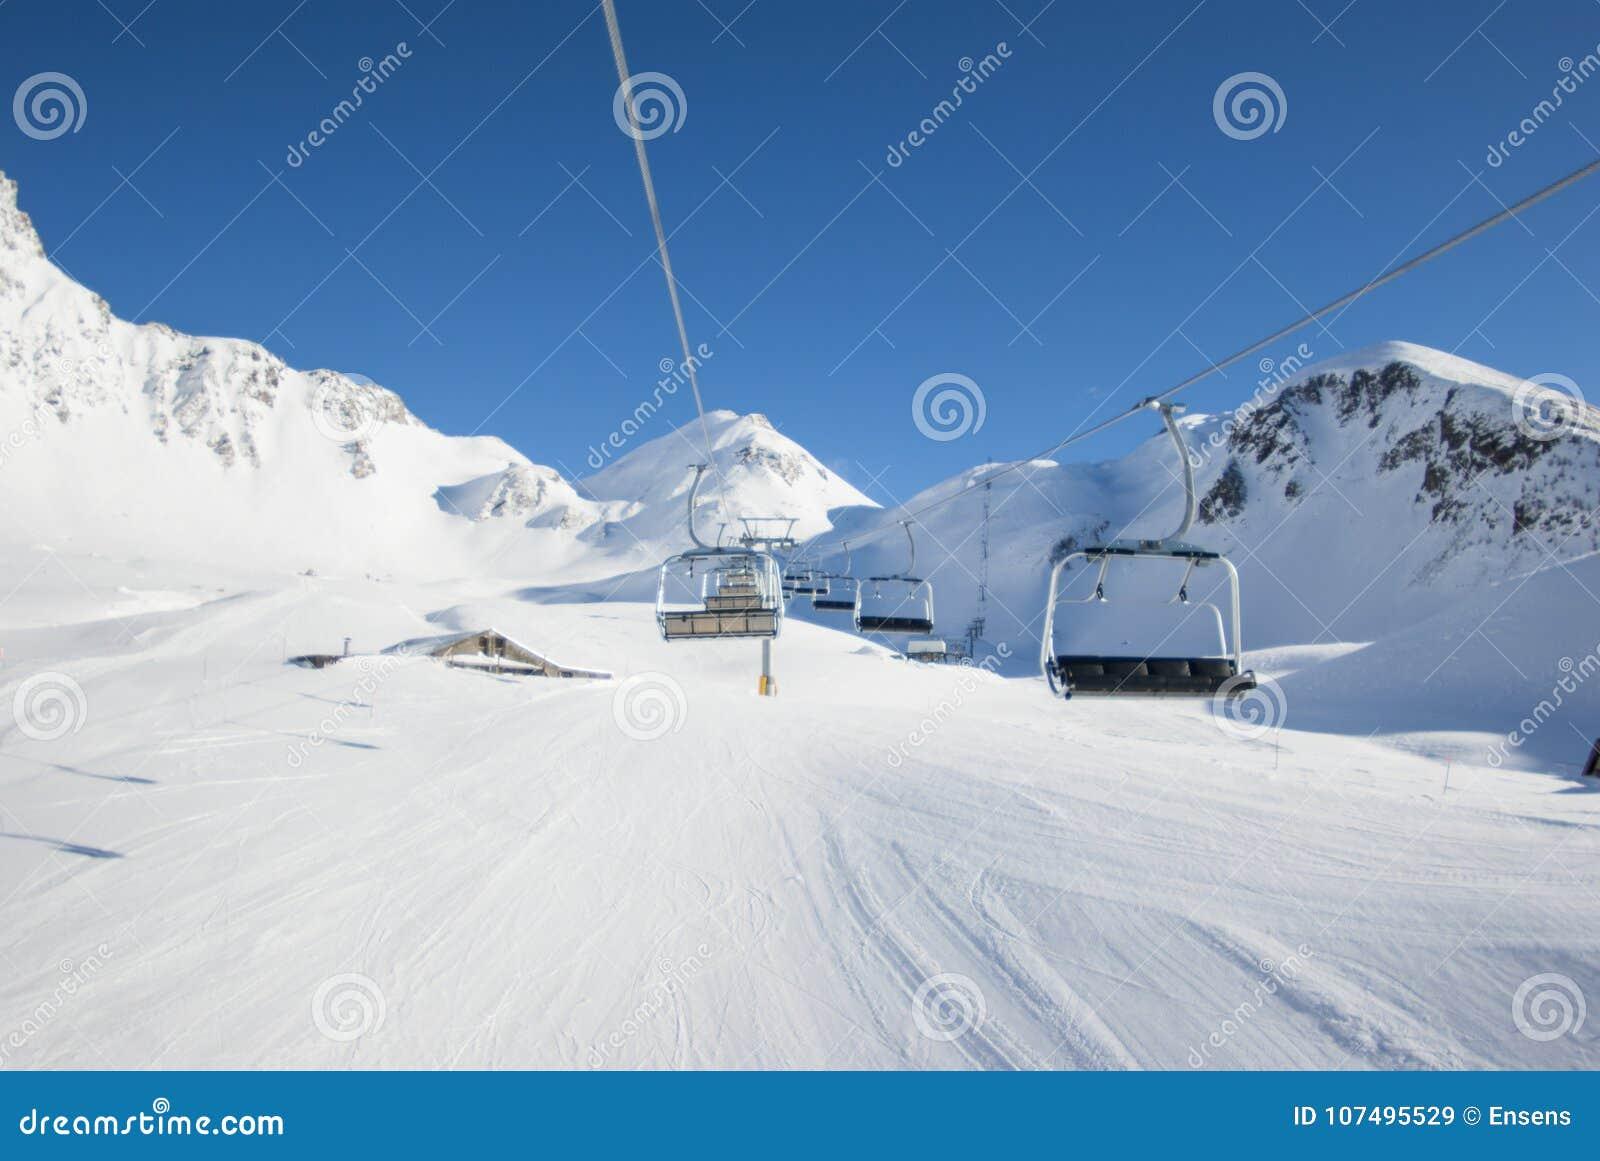 San Domenico, Varzo, Alpes, Italie, télésiège qui va en amont